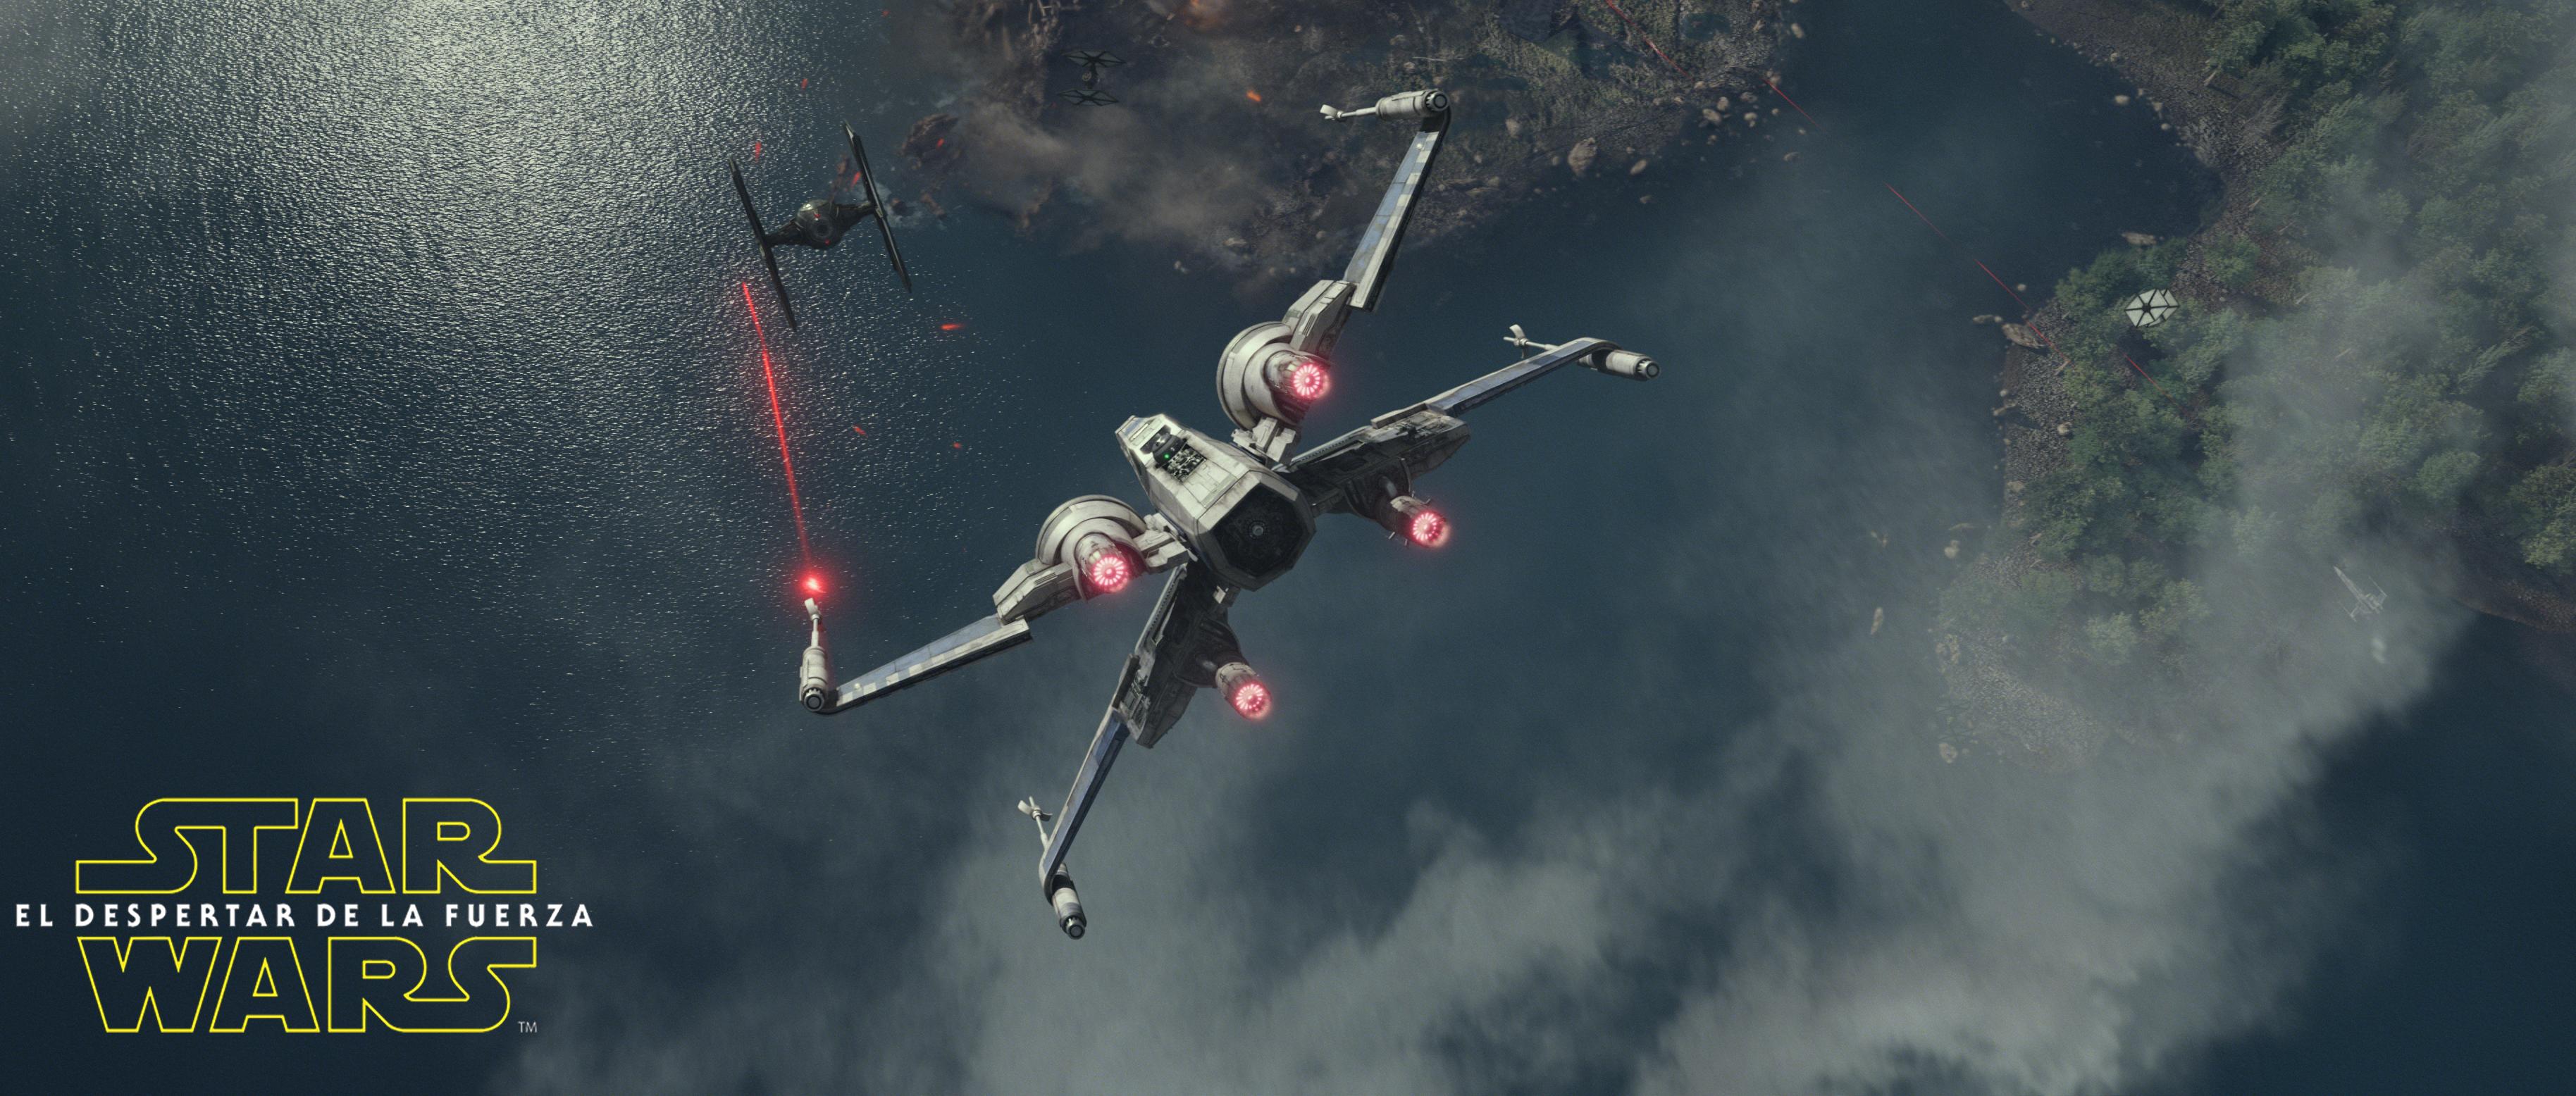 Star Wars The Force Awakens wallpaper 15